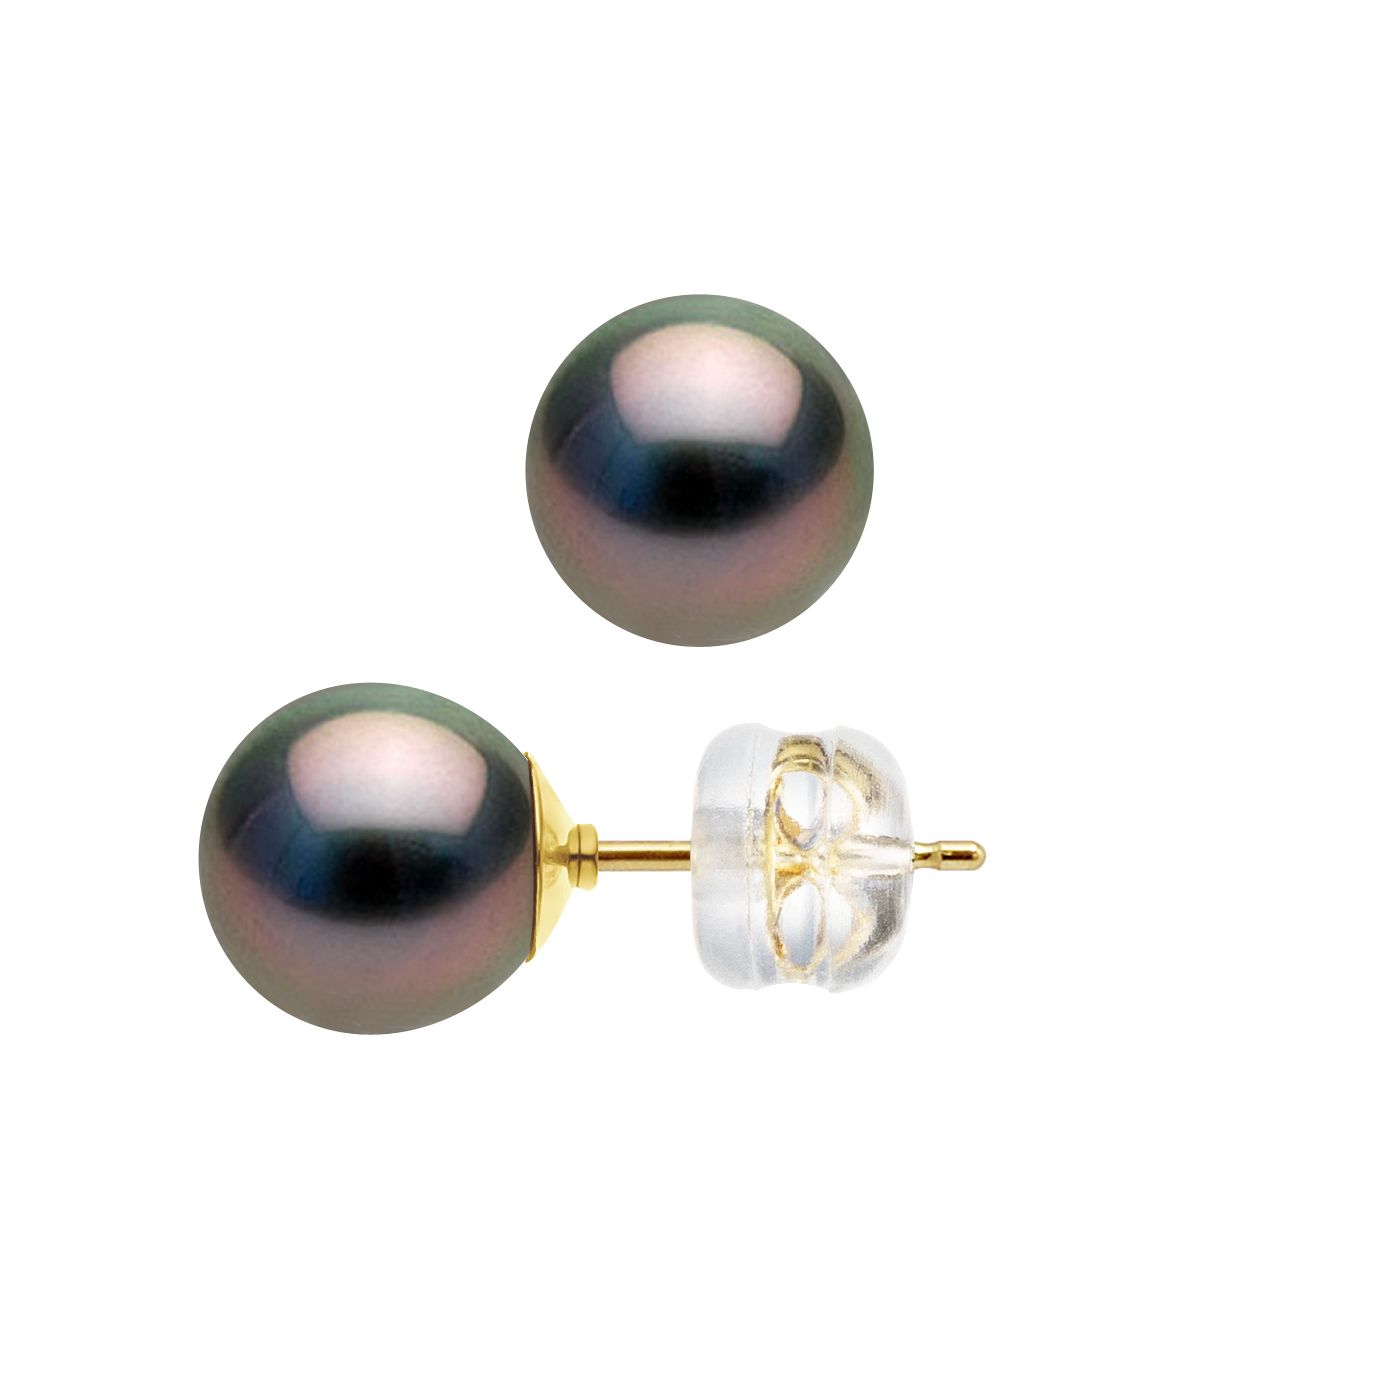 DIADEMA - Earrings - Yellow Gold and Real Tahitian Pearls